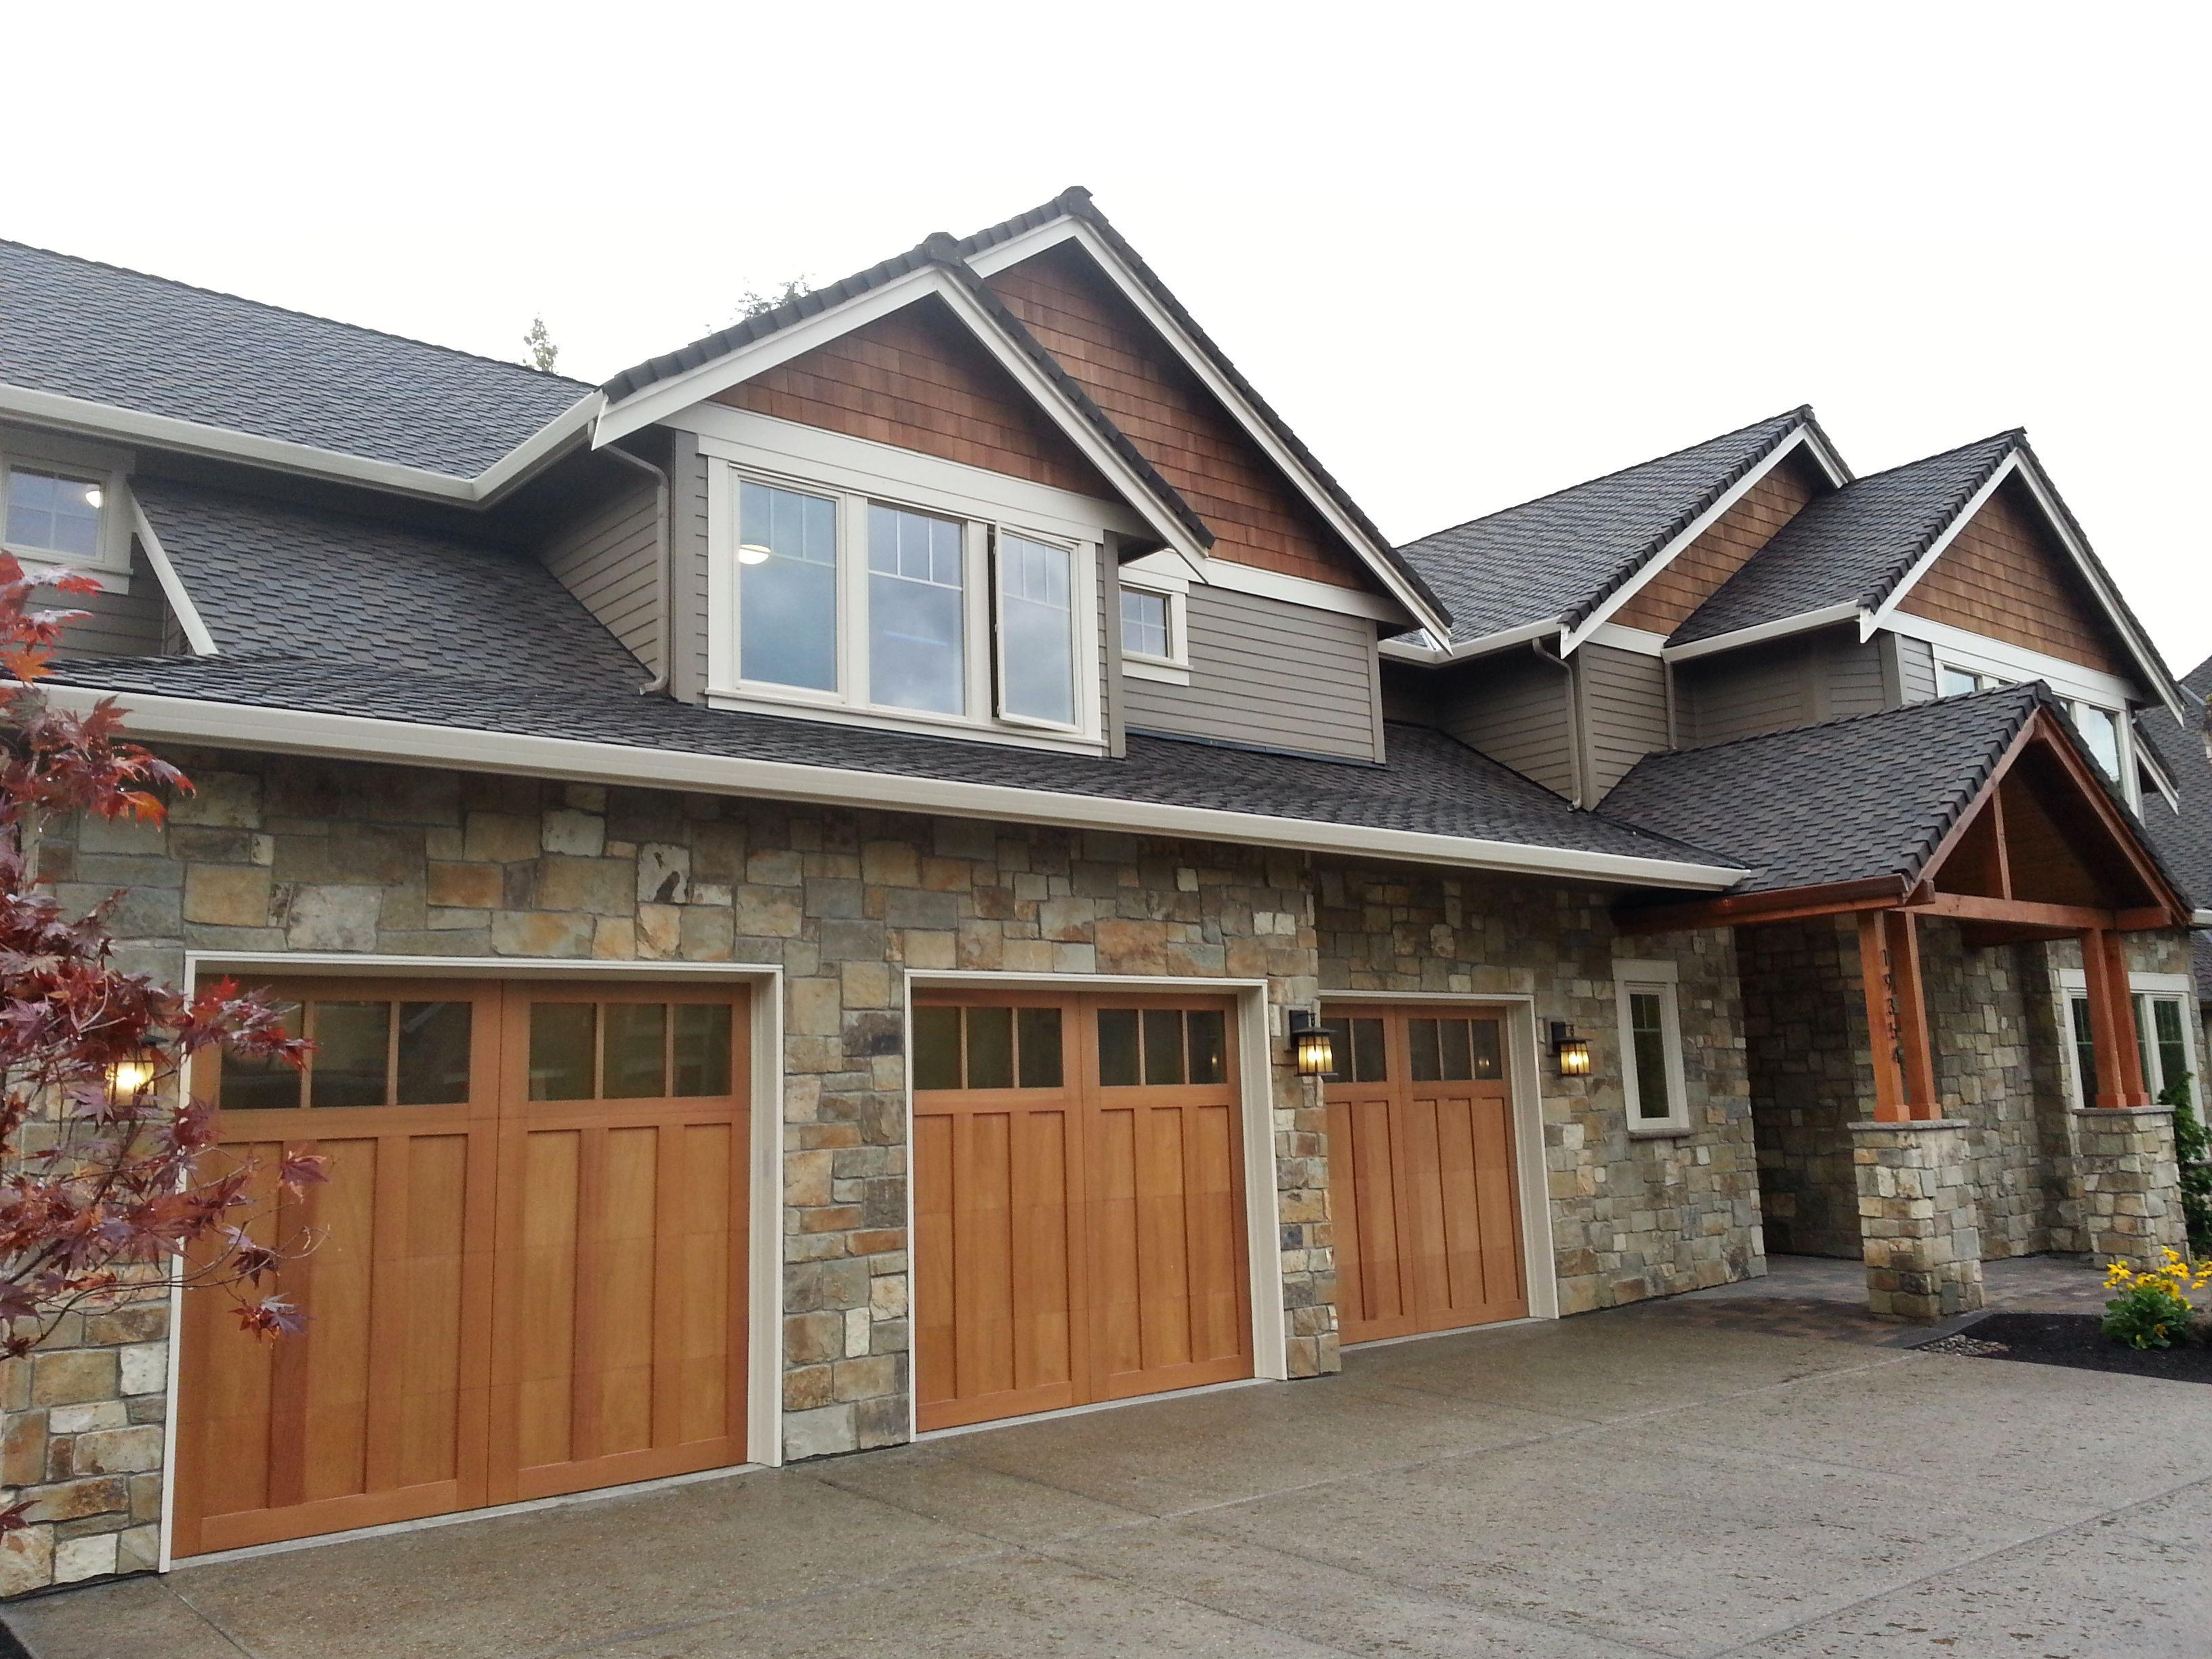 Natural Stone Construction : Natural stone veneer around garage